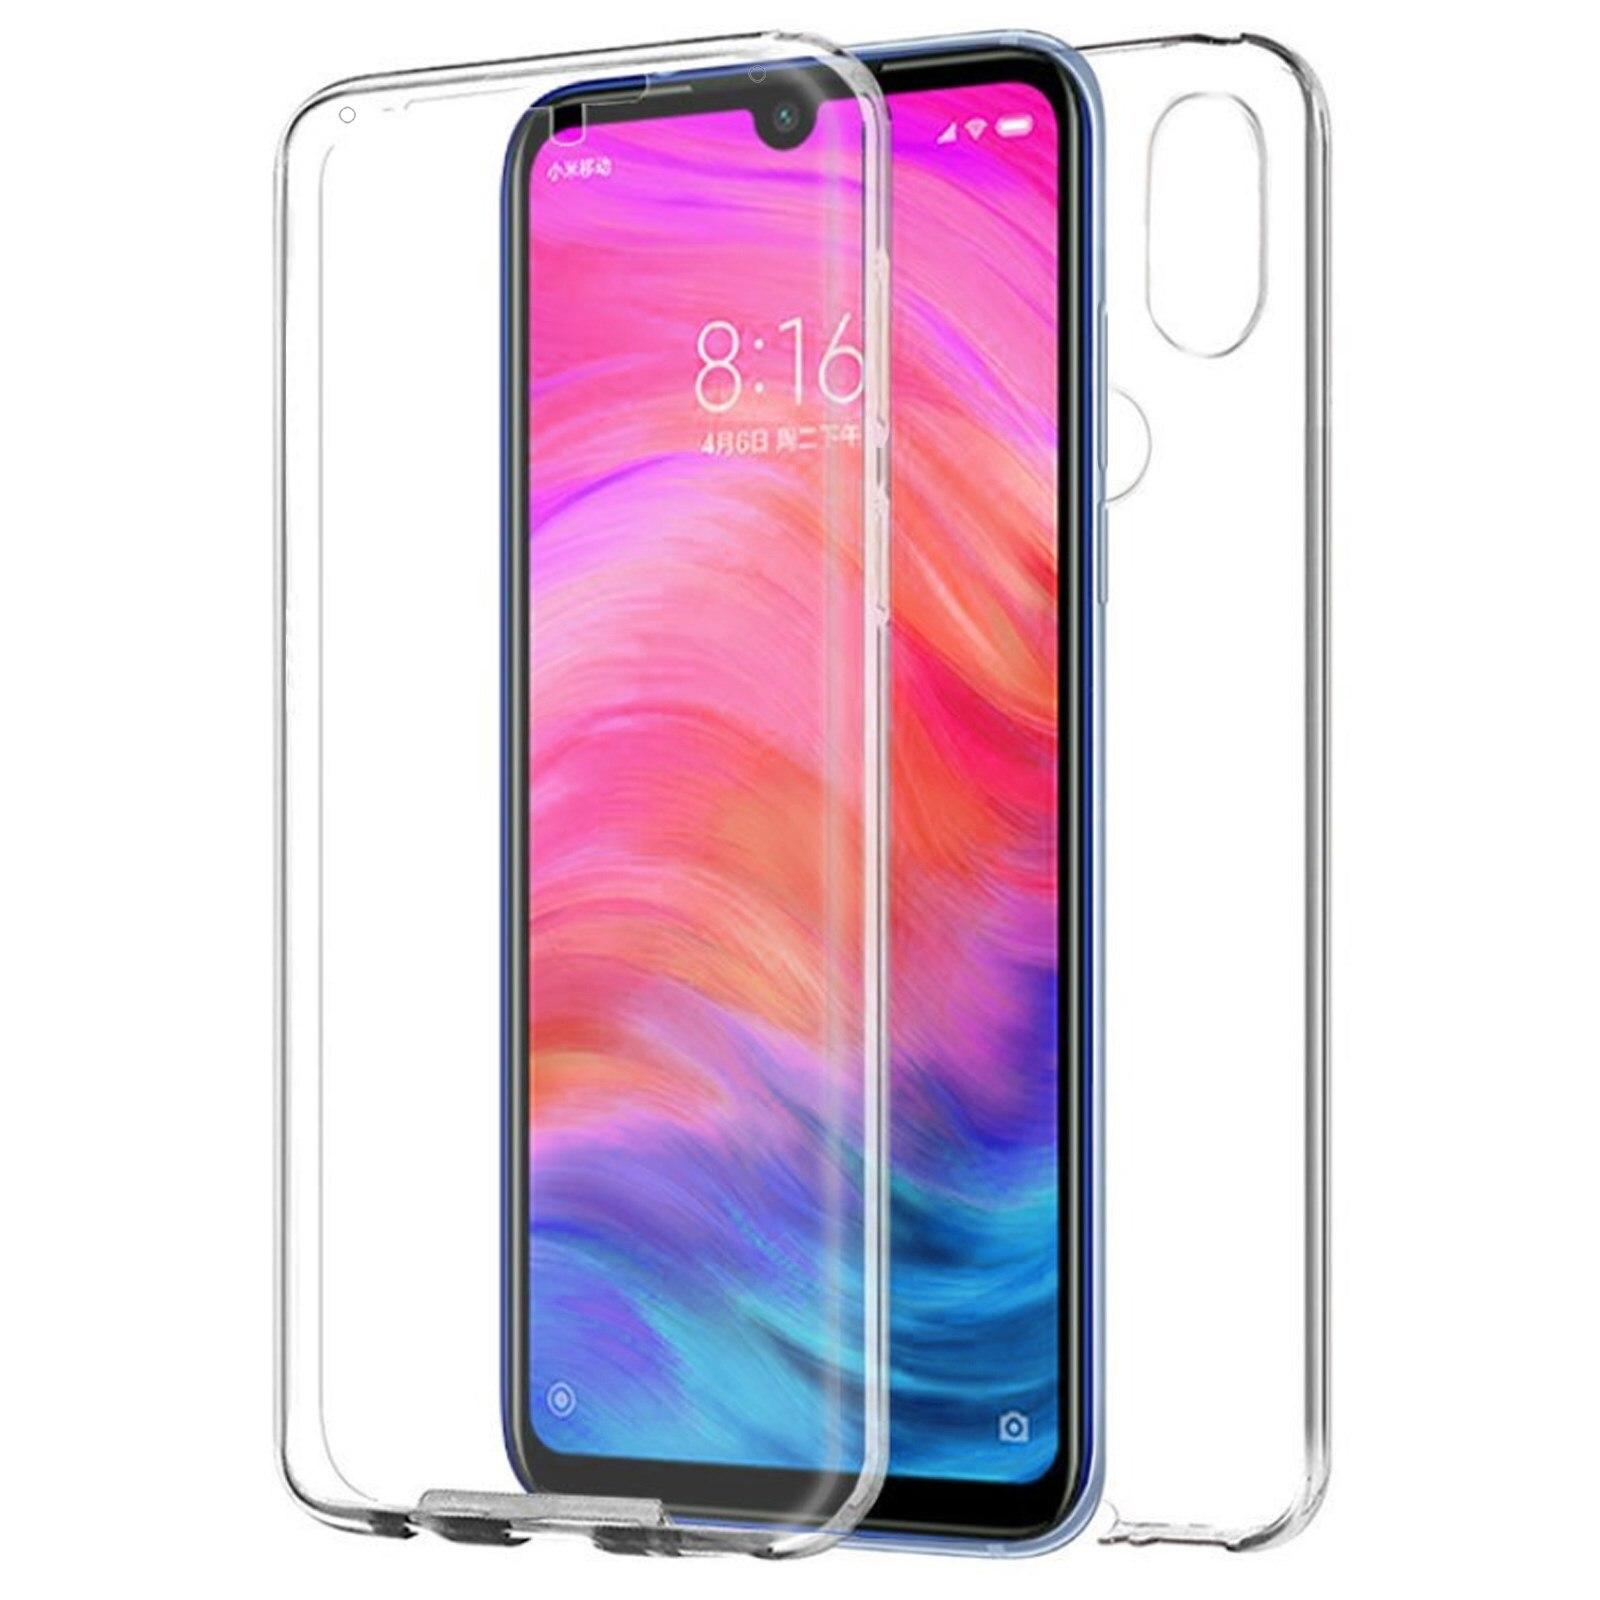 TBOC Case voor Xiaomi Redmi Note 7 [6.3 ]-Module [Transparante] Full [Siliconen TPU] dubbele Gezicht [360 Graden] Mobiele